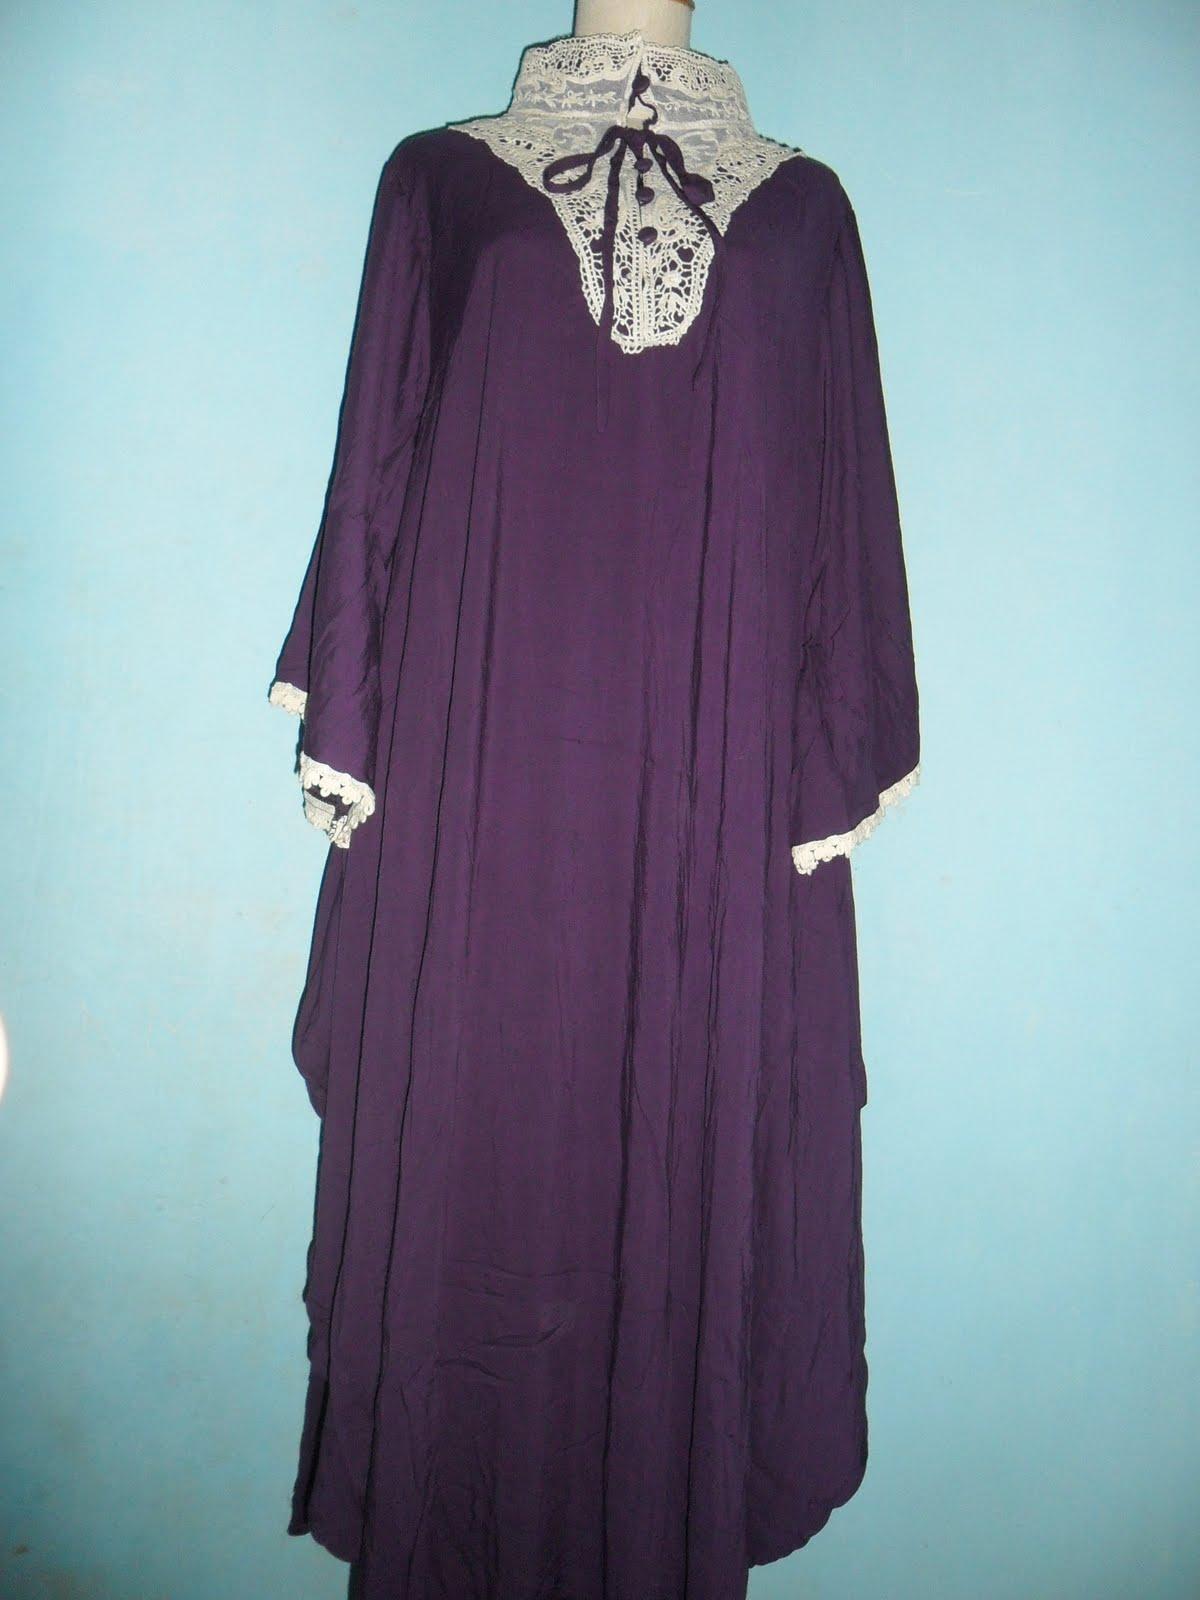 Baju muslim baju anak kaos anak baju gamis pakaian wanita Baju gamis anak kaos